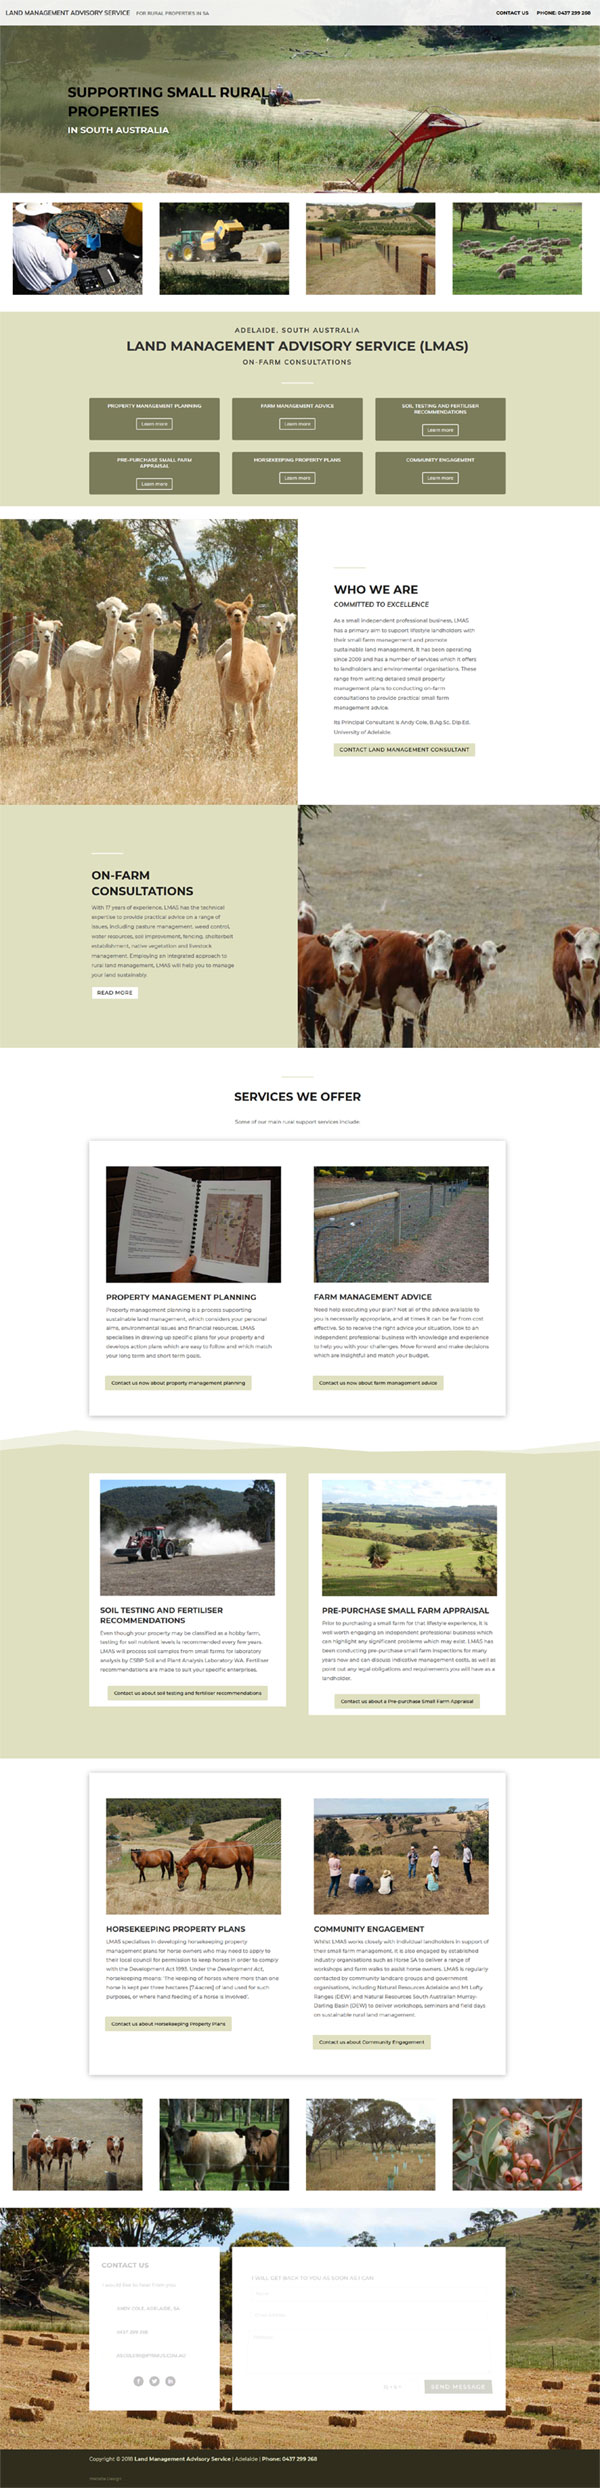 Website for Land Management Advisory Service | Website Adelaide